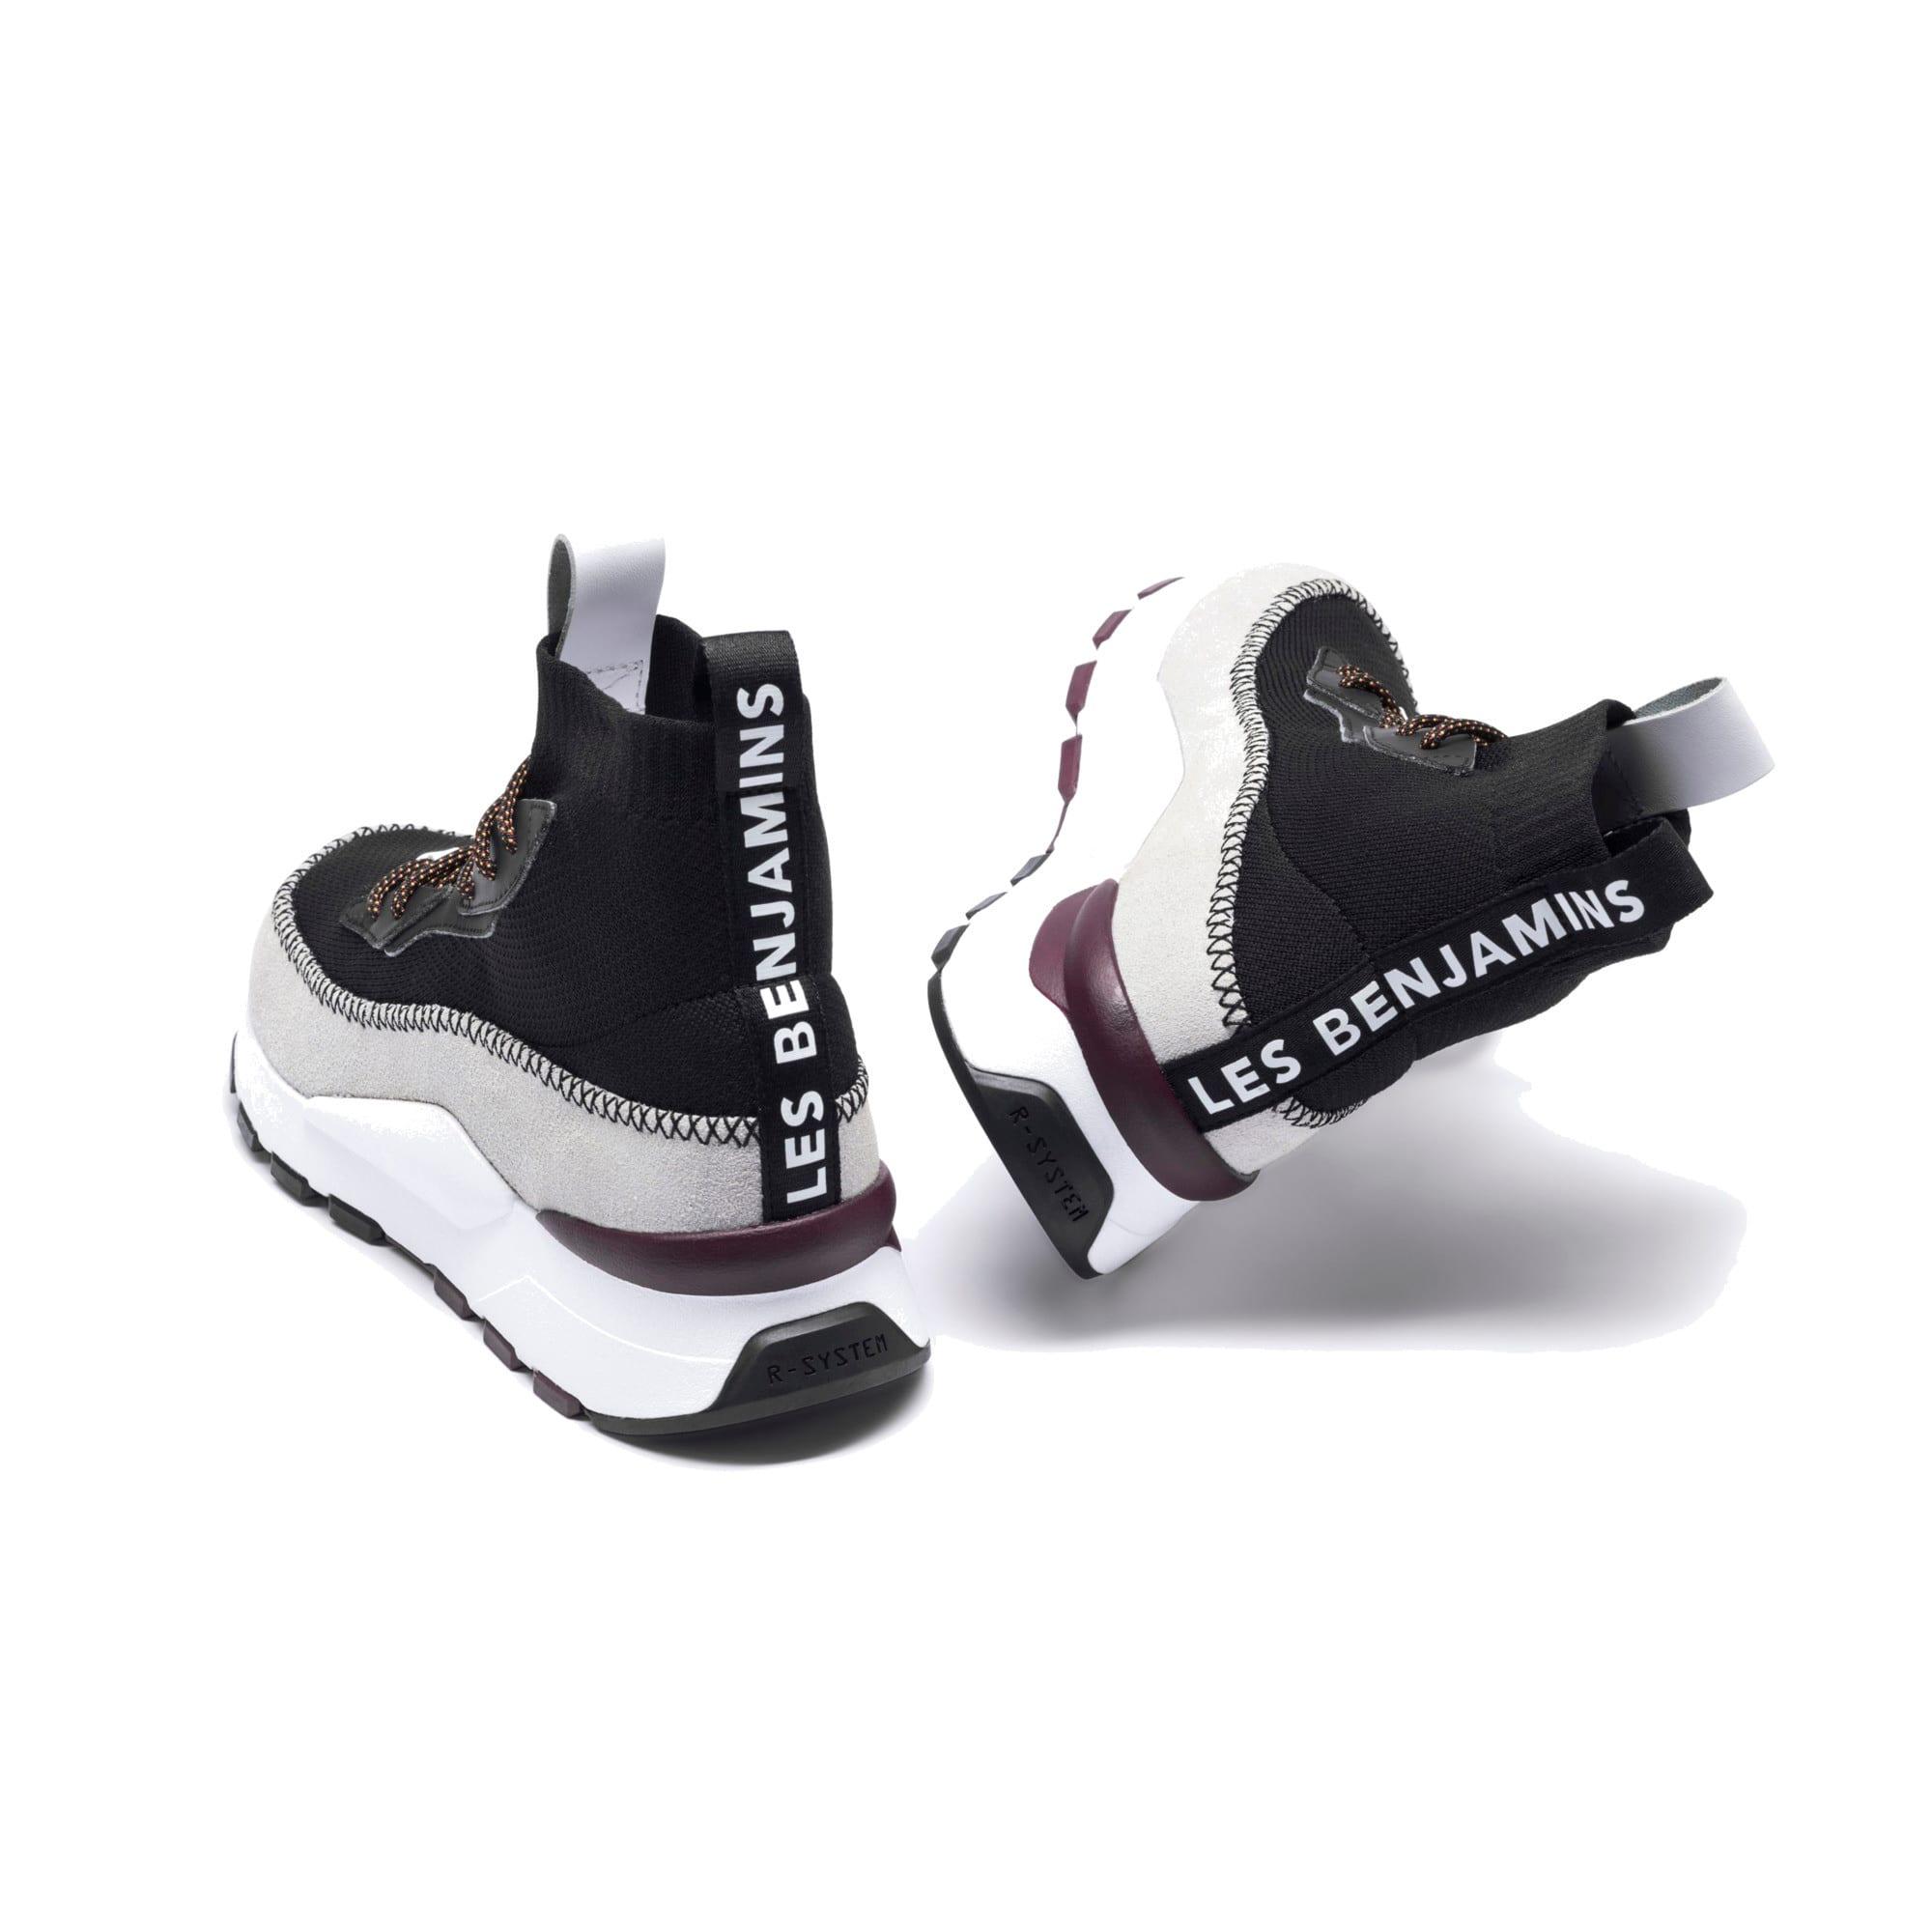 Thumbnail 11 of RS-0 LES BENJAMINS Sneakers, Puma White-Puma Black, medium